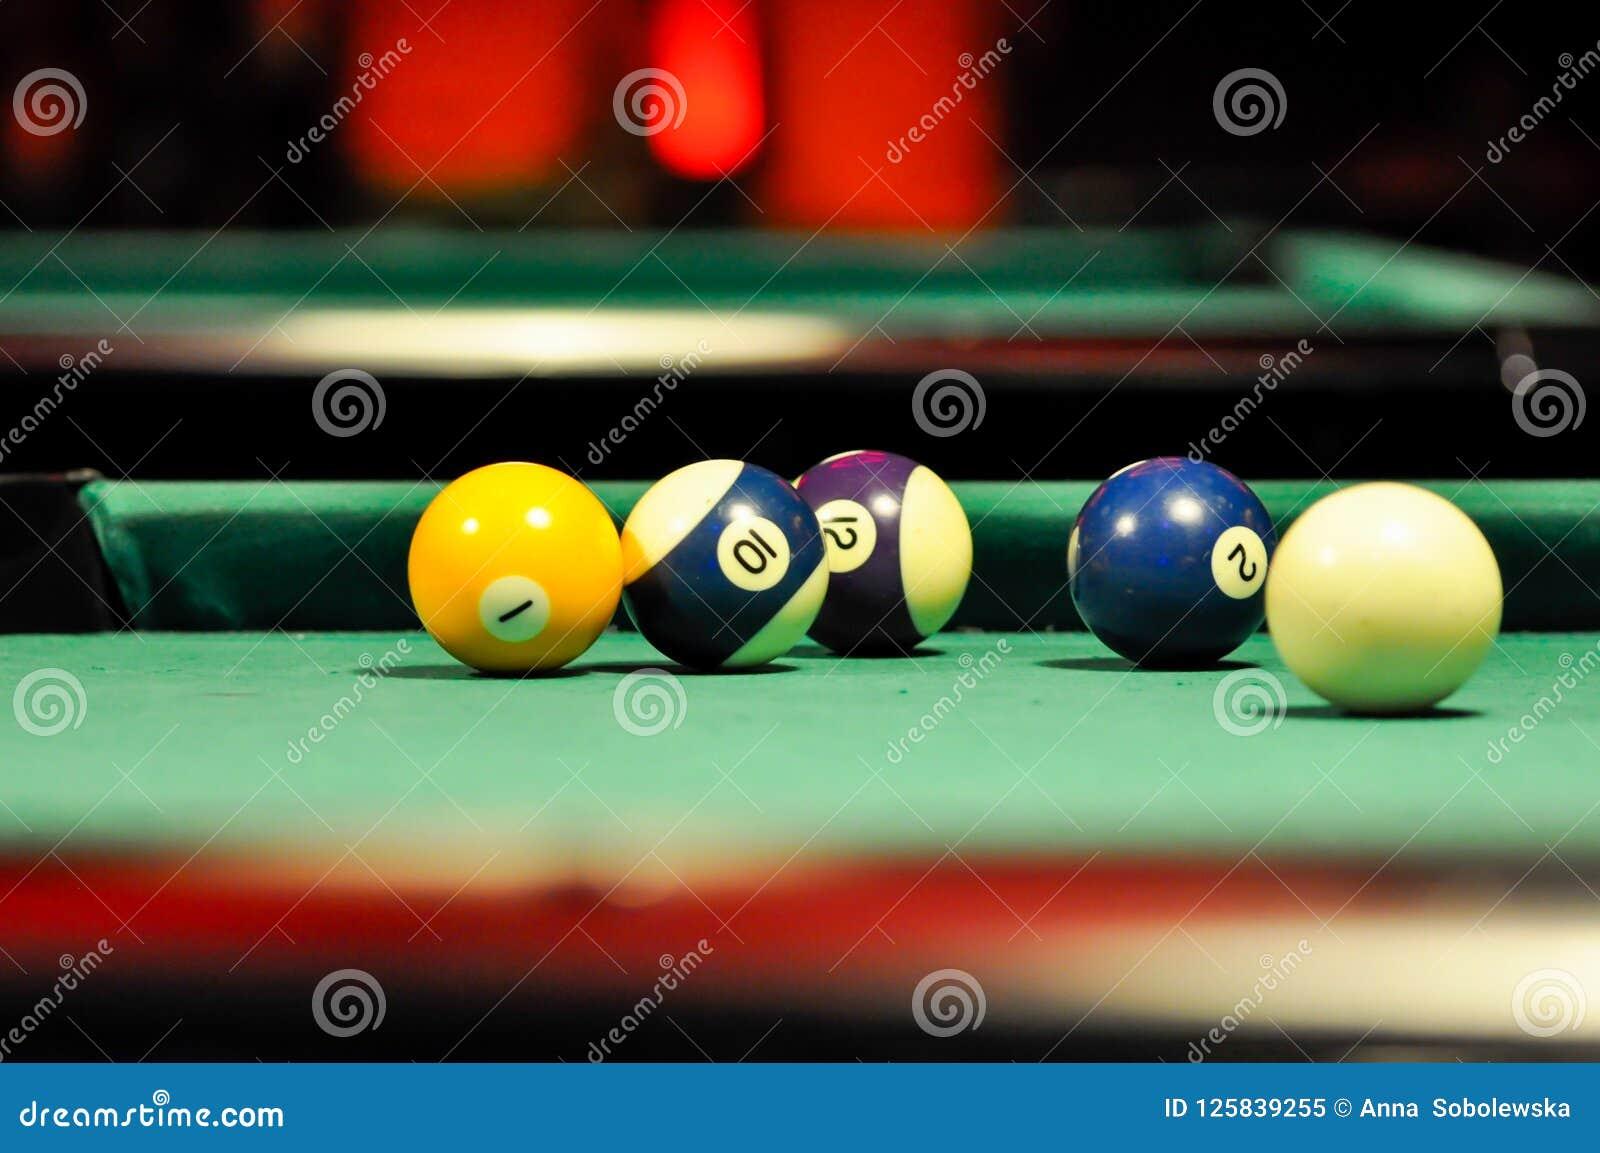 Billard table for playing tournament inside pub